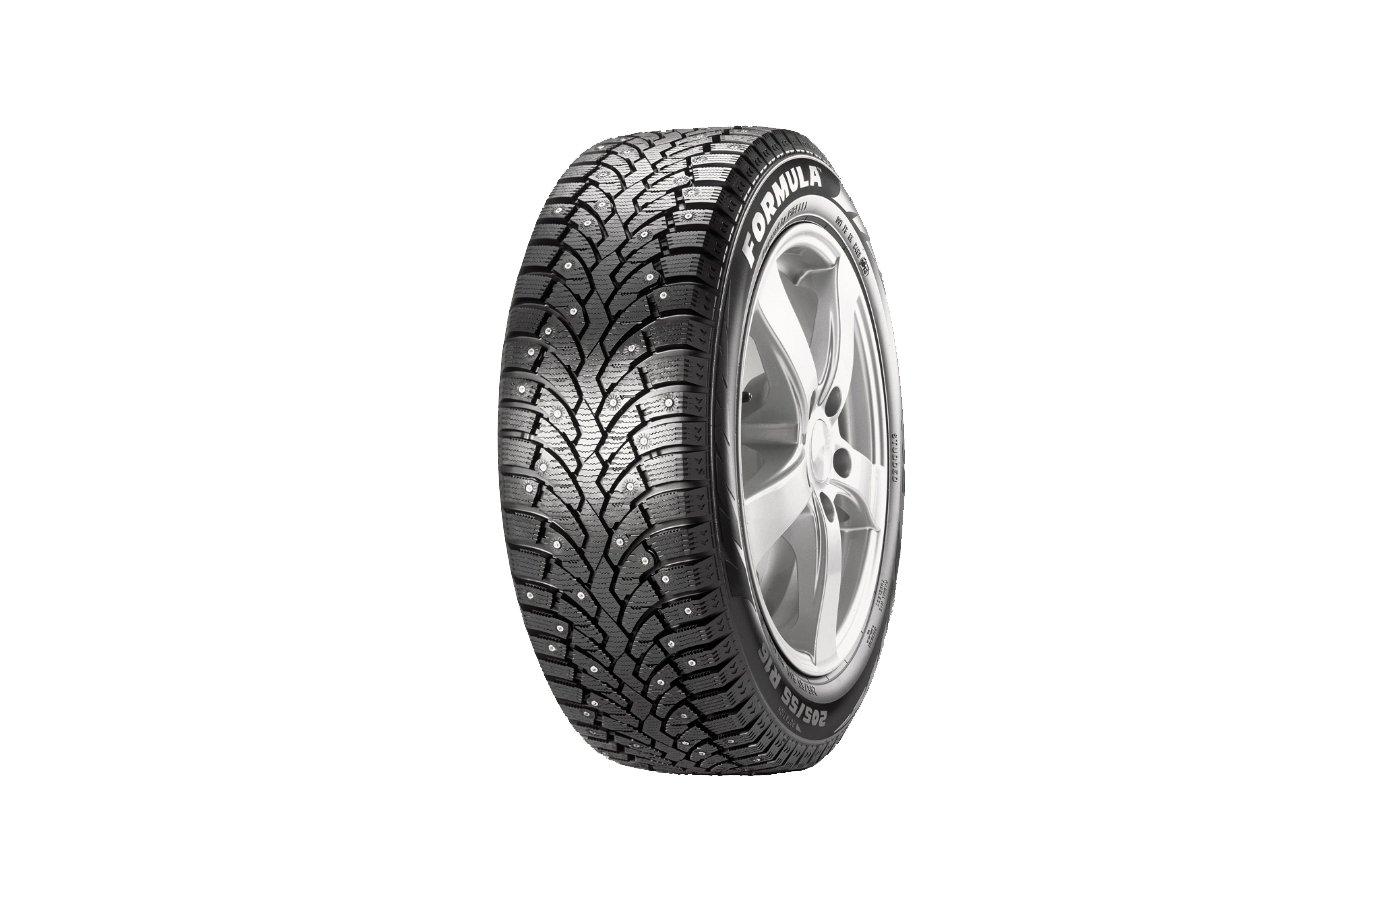 Шина Pirelli Formula Ice 225/60 R17 TL 99T шип